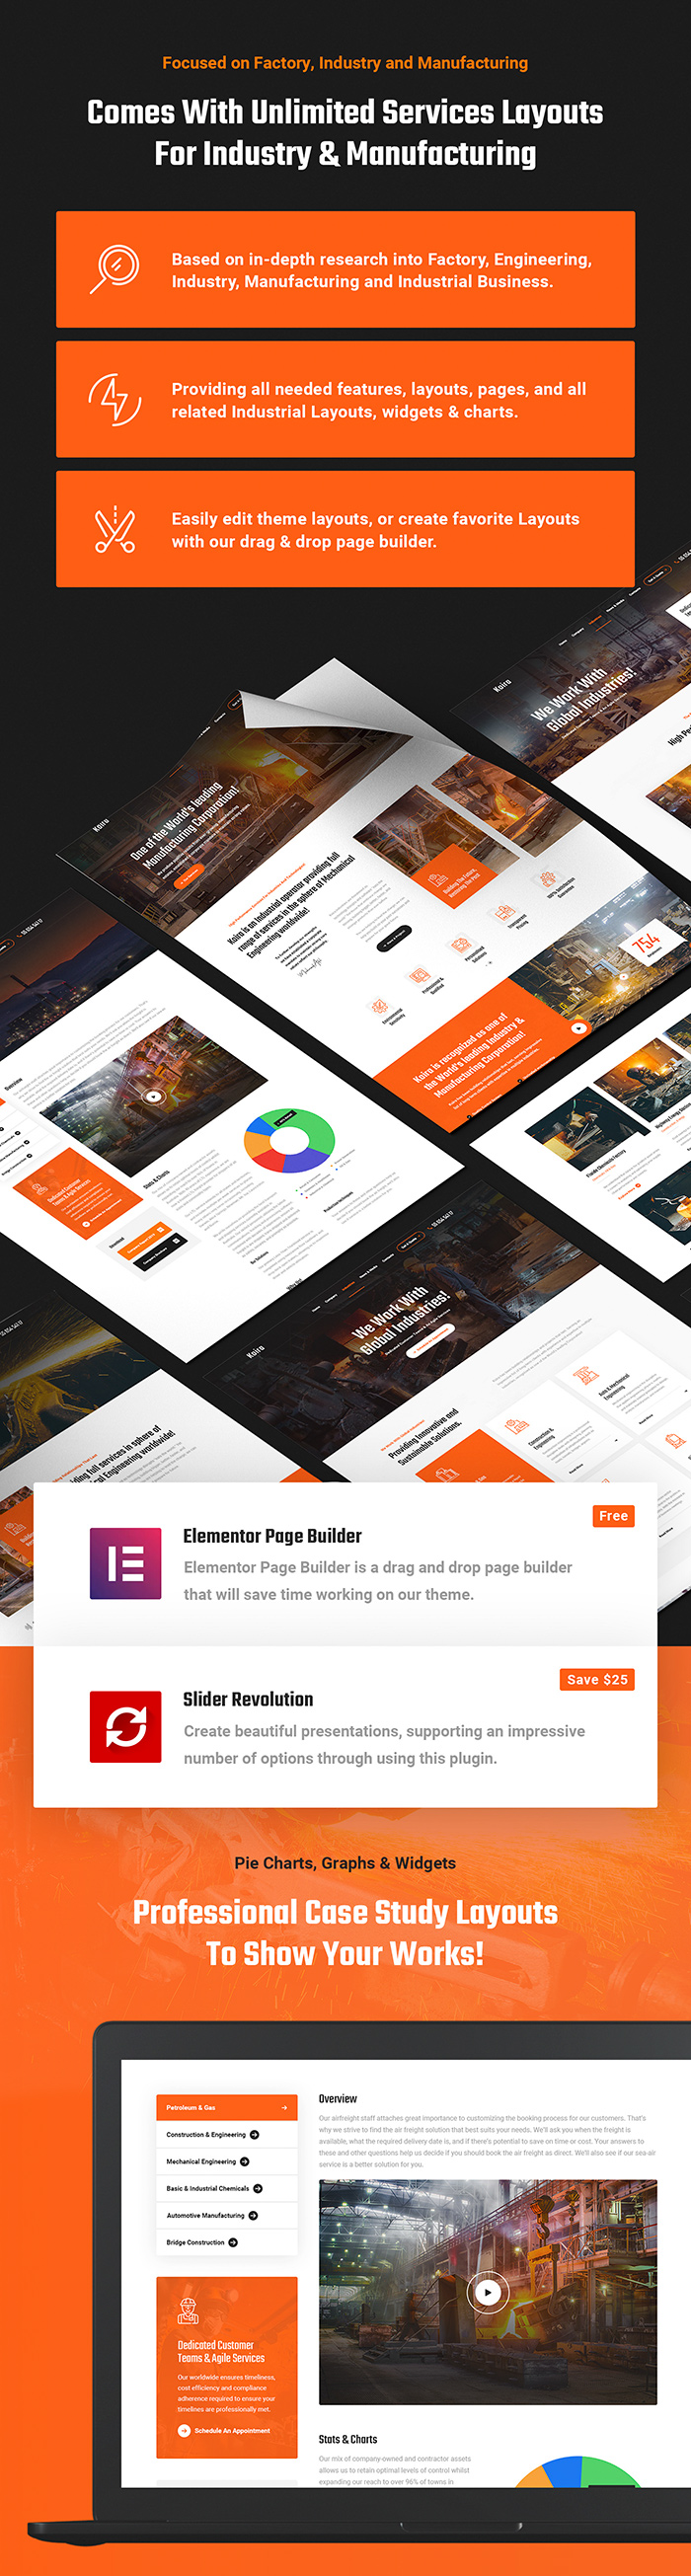 Koira - Industry and Manufacturing WordPress Theme - 3